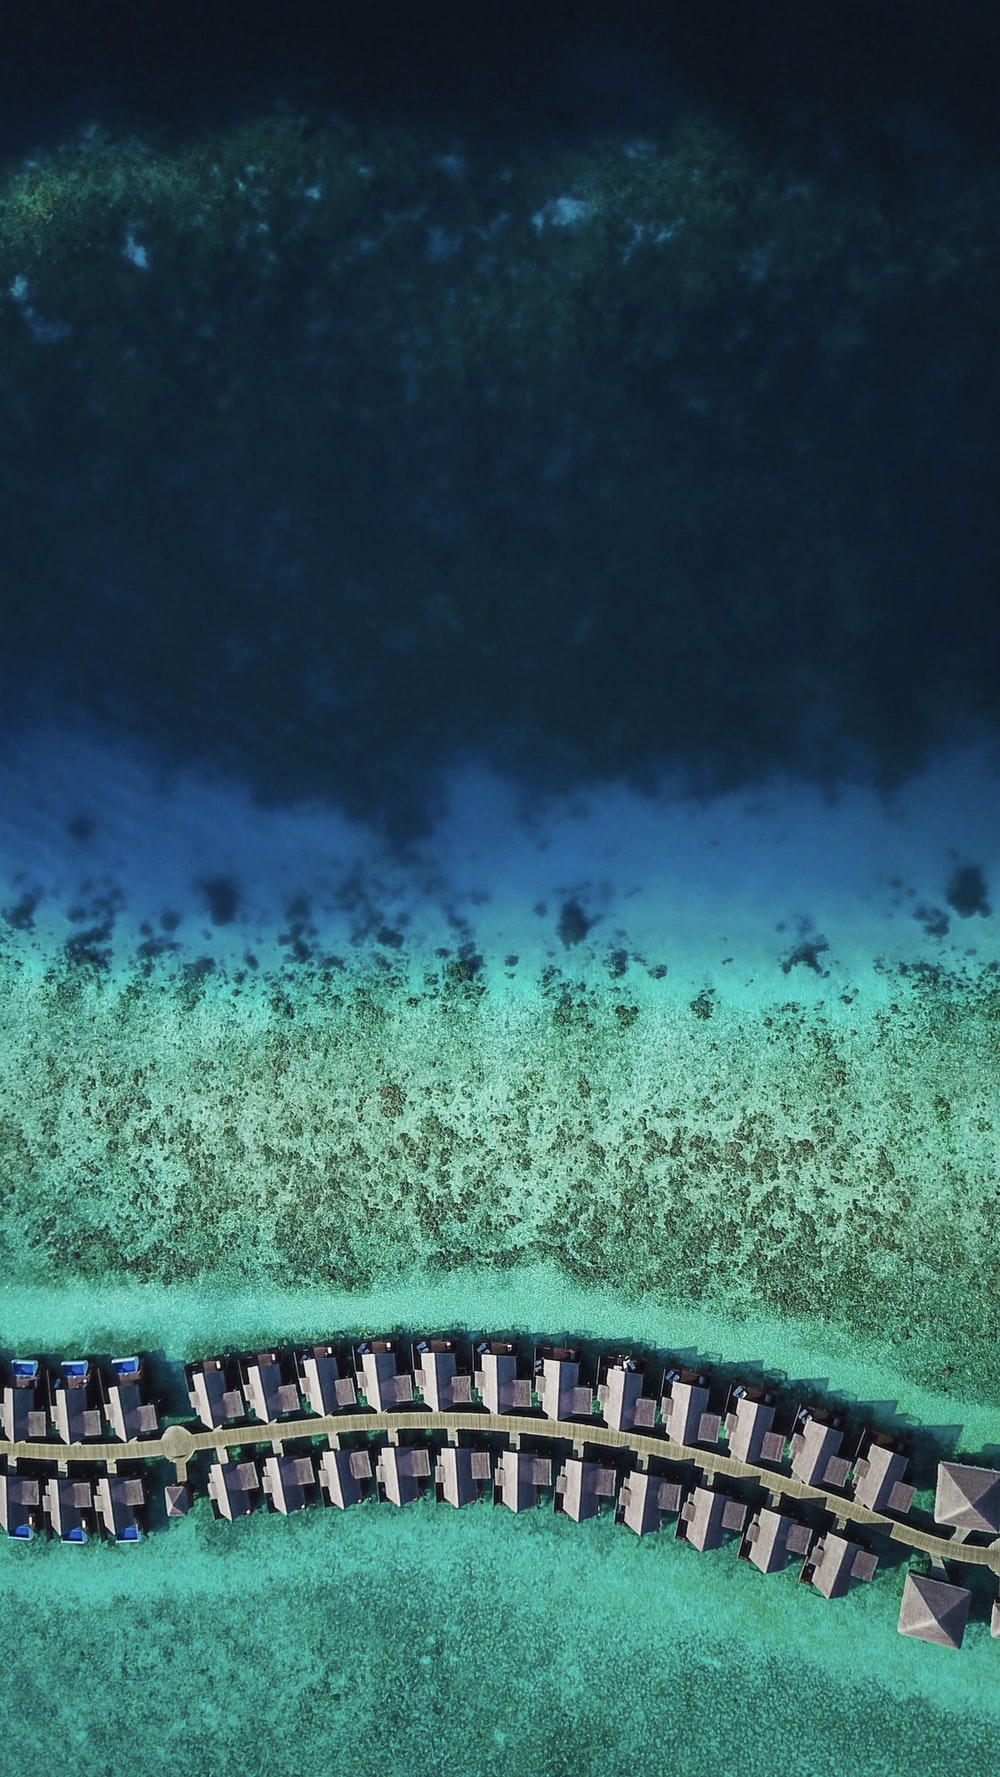 bird's-eye view photography of beach line